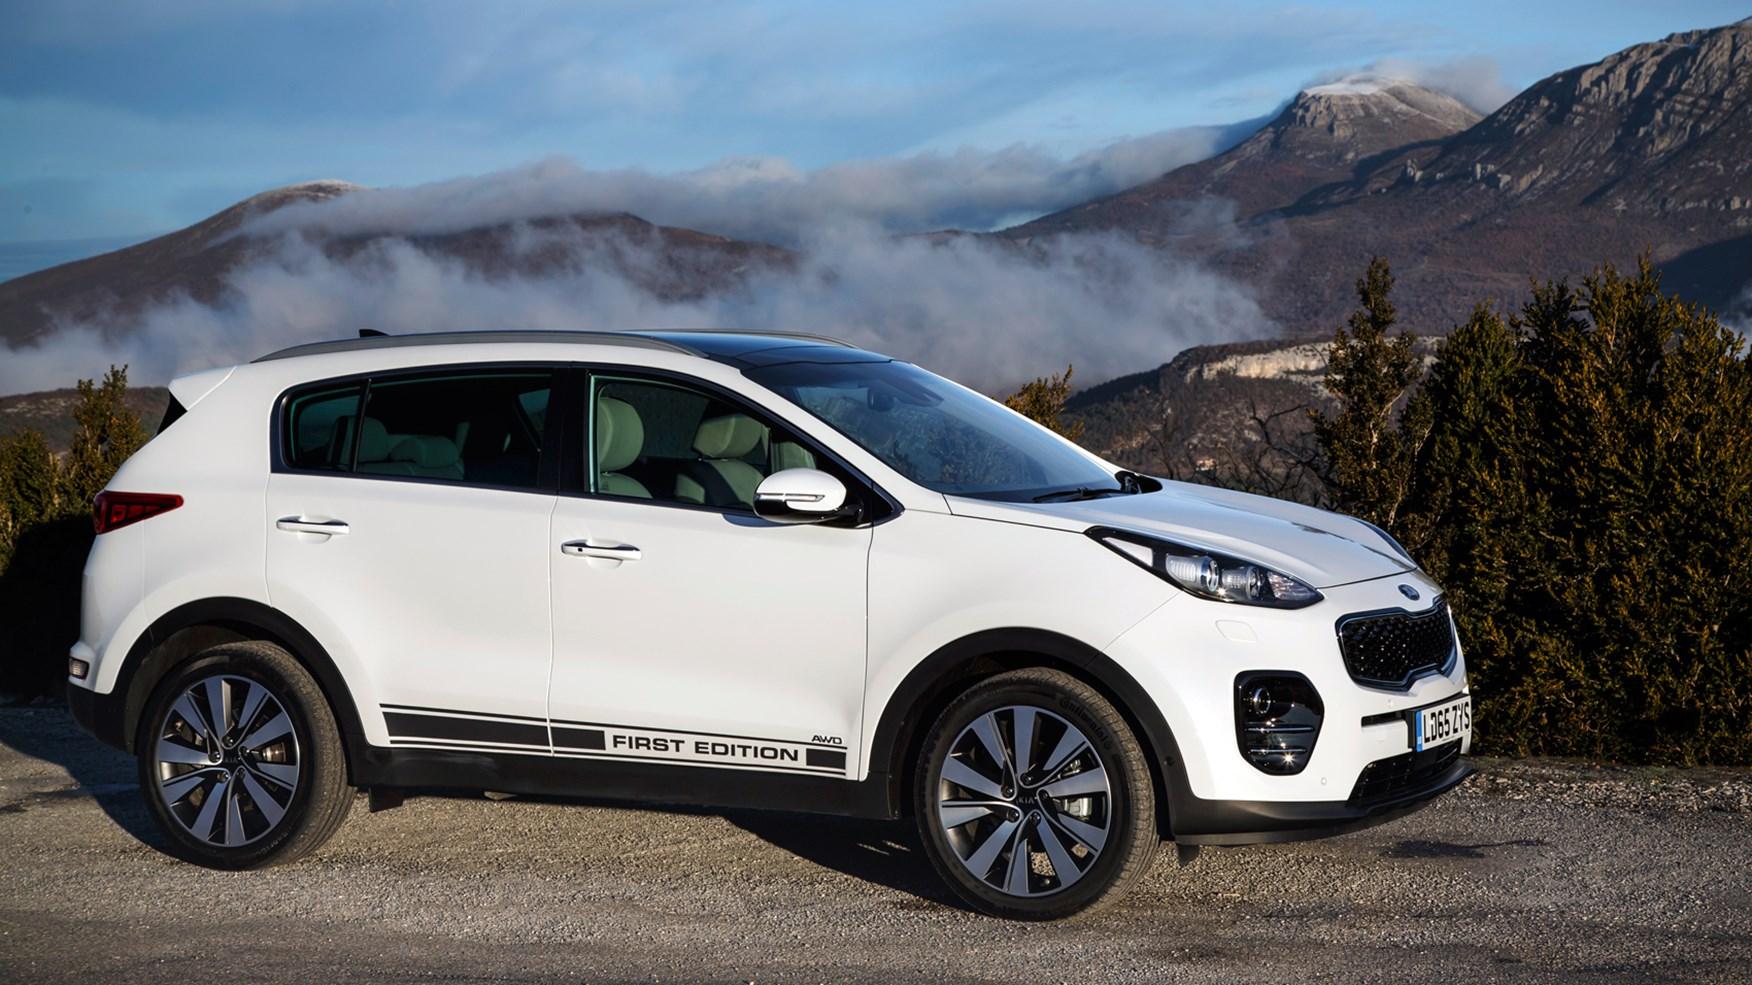 Lease Car Deals 0 Down >> Kia Sportage First Edition 2.0 CRDi (2016) review   CAR Magazine